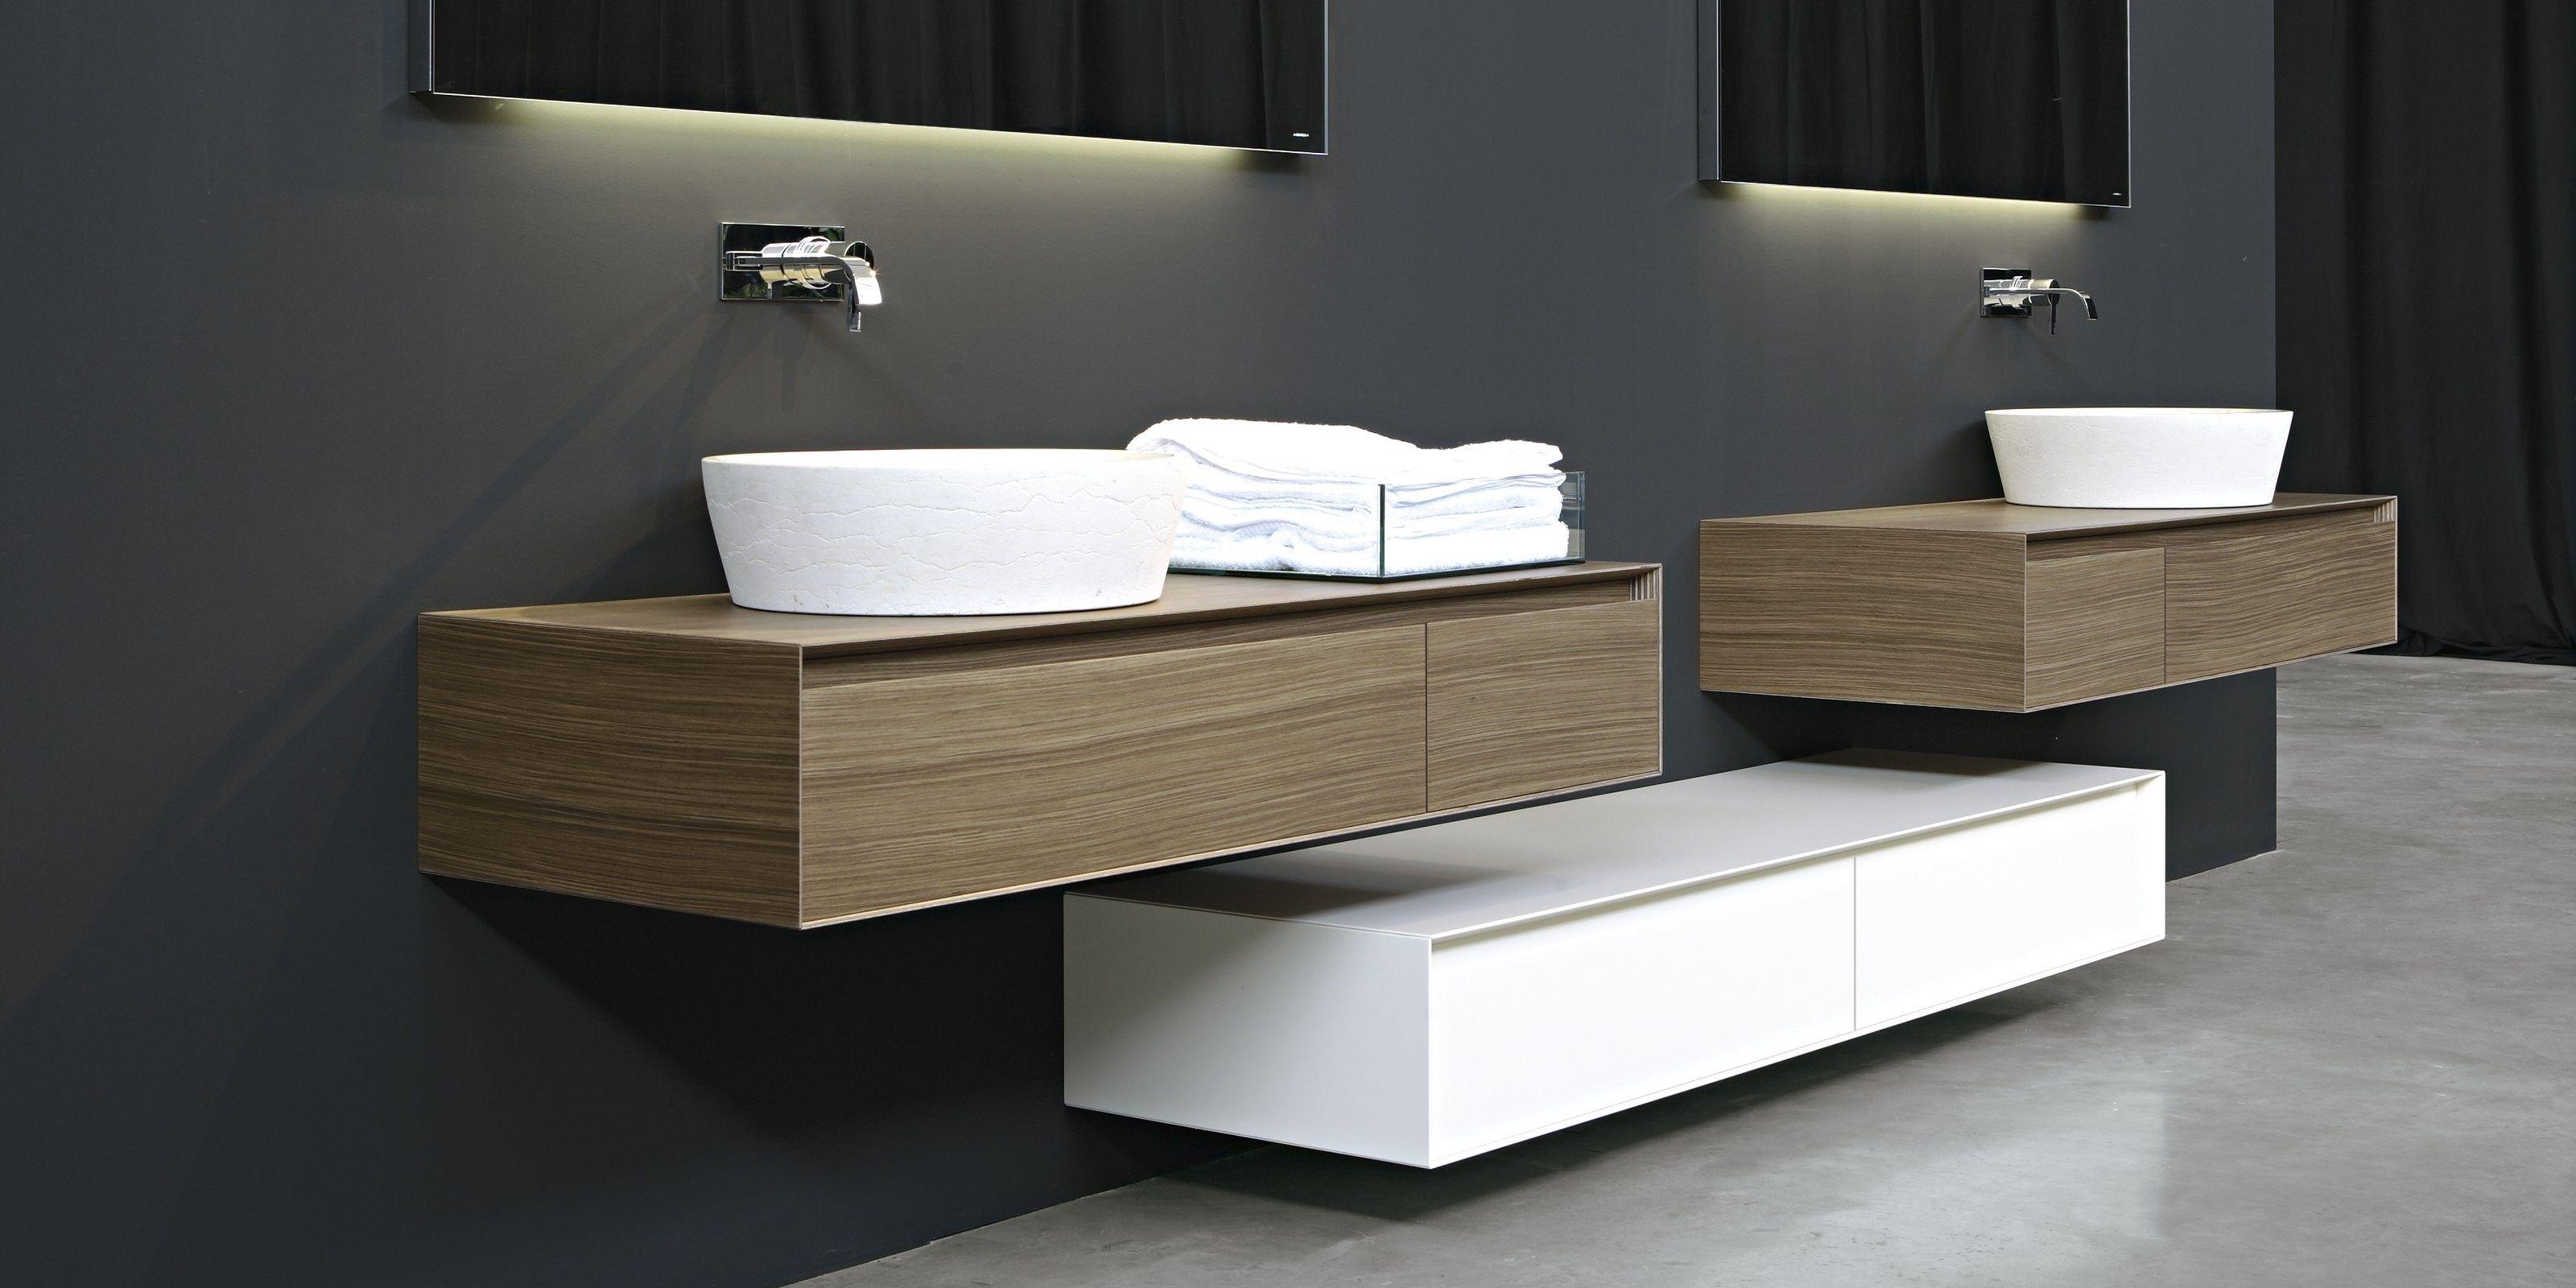 panta rei by antonio lupi design. Black Bedroom Furniture Sets. Home Design Ideas